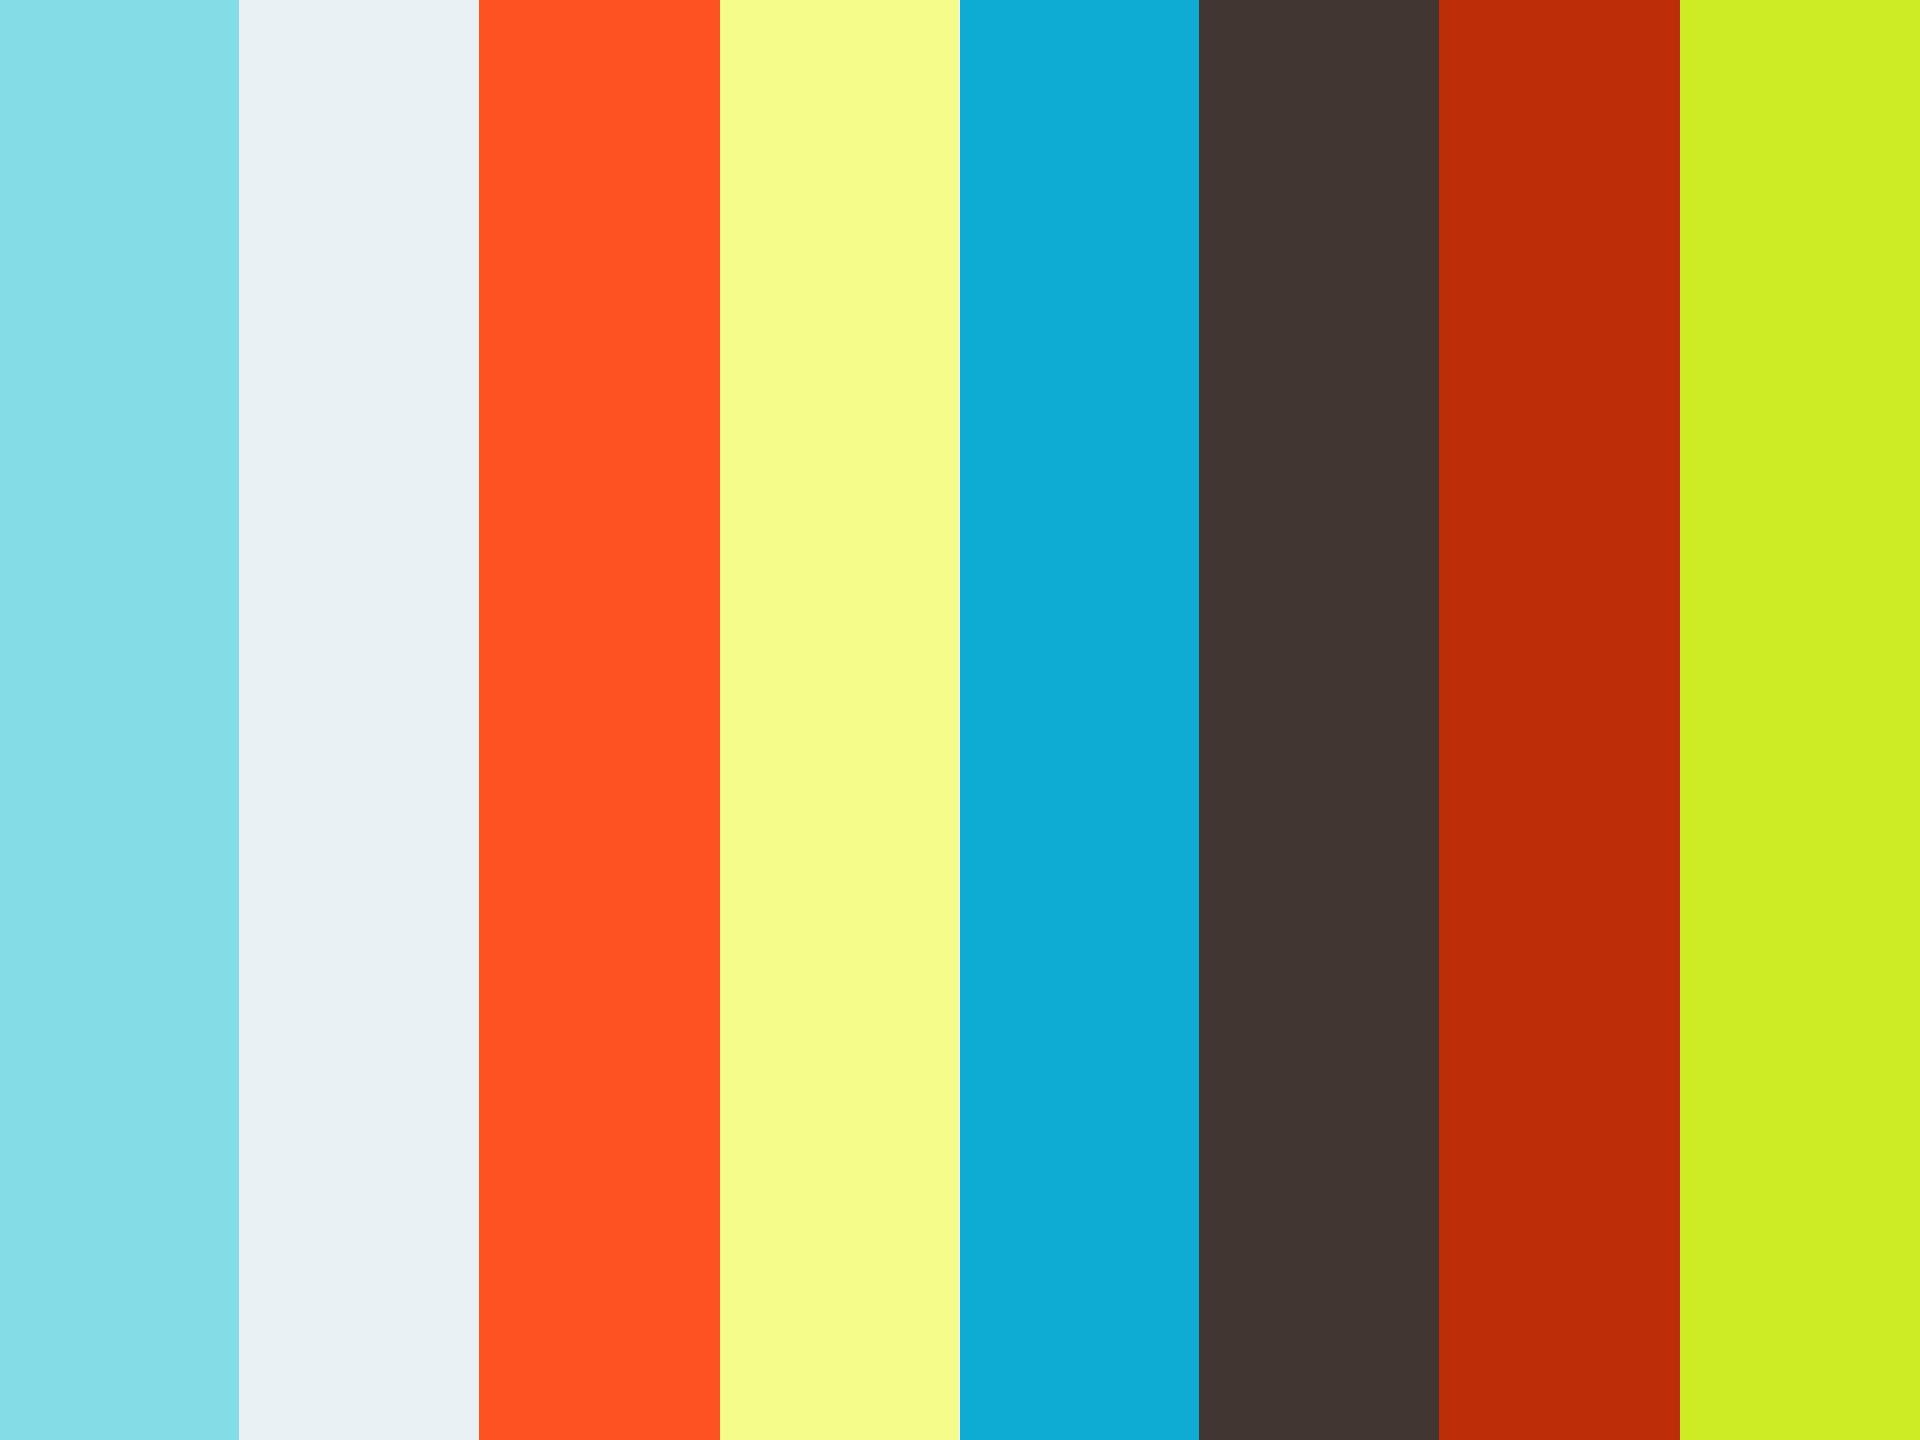 MERCEDES BENZ G63 - BLACK - 2016